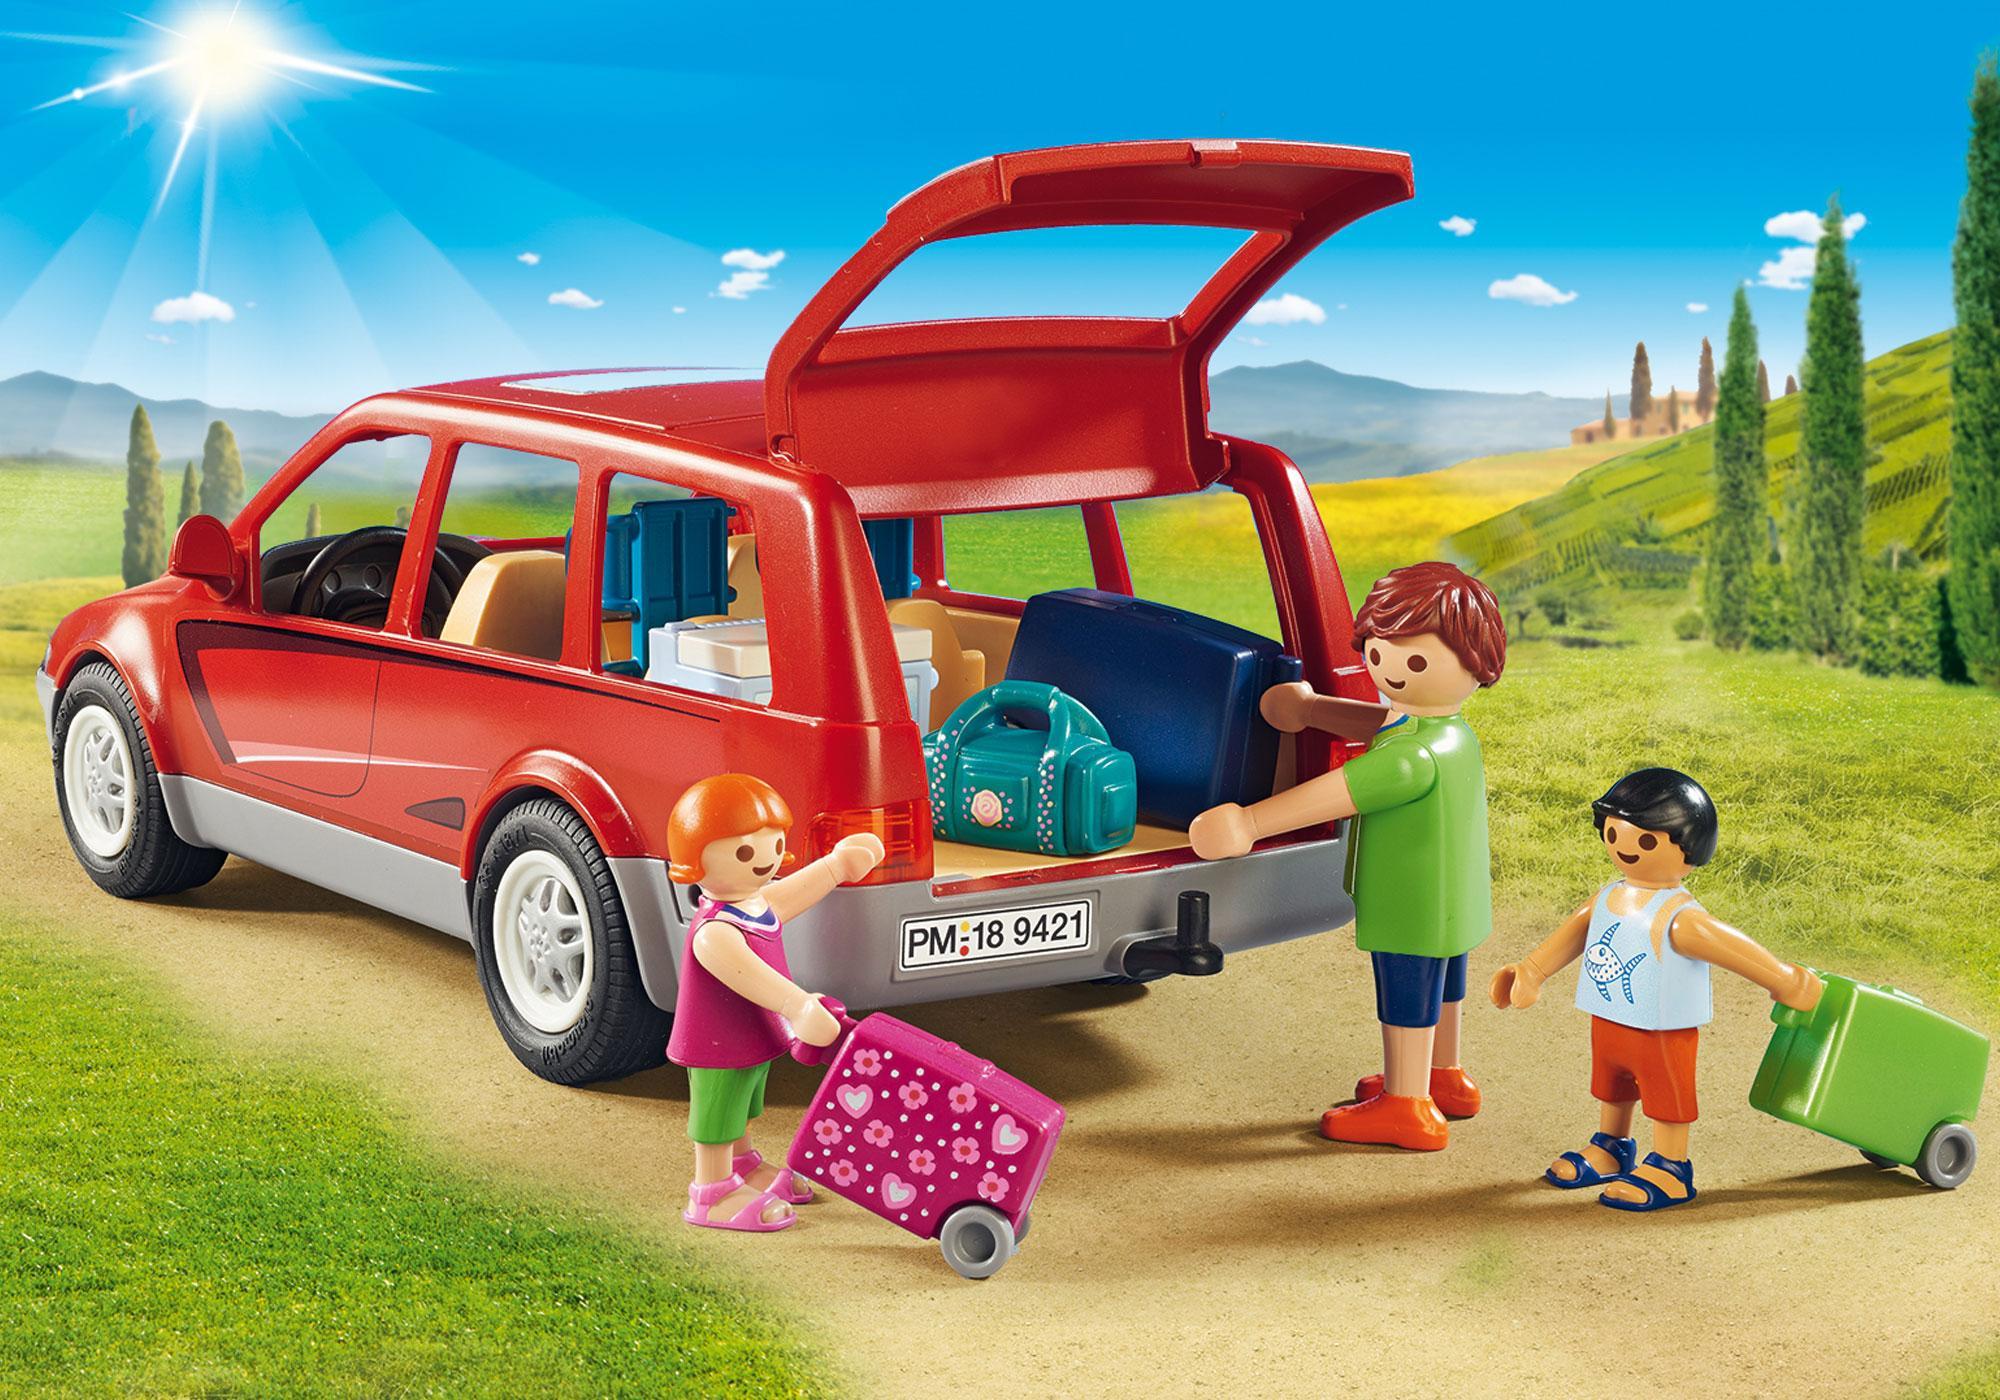 http://media.playmobil.com/i/playmobil/9421_product_extra1